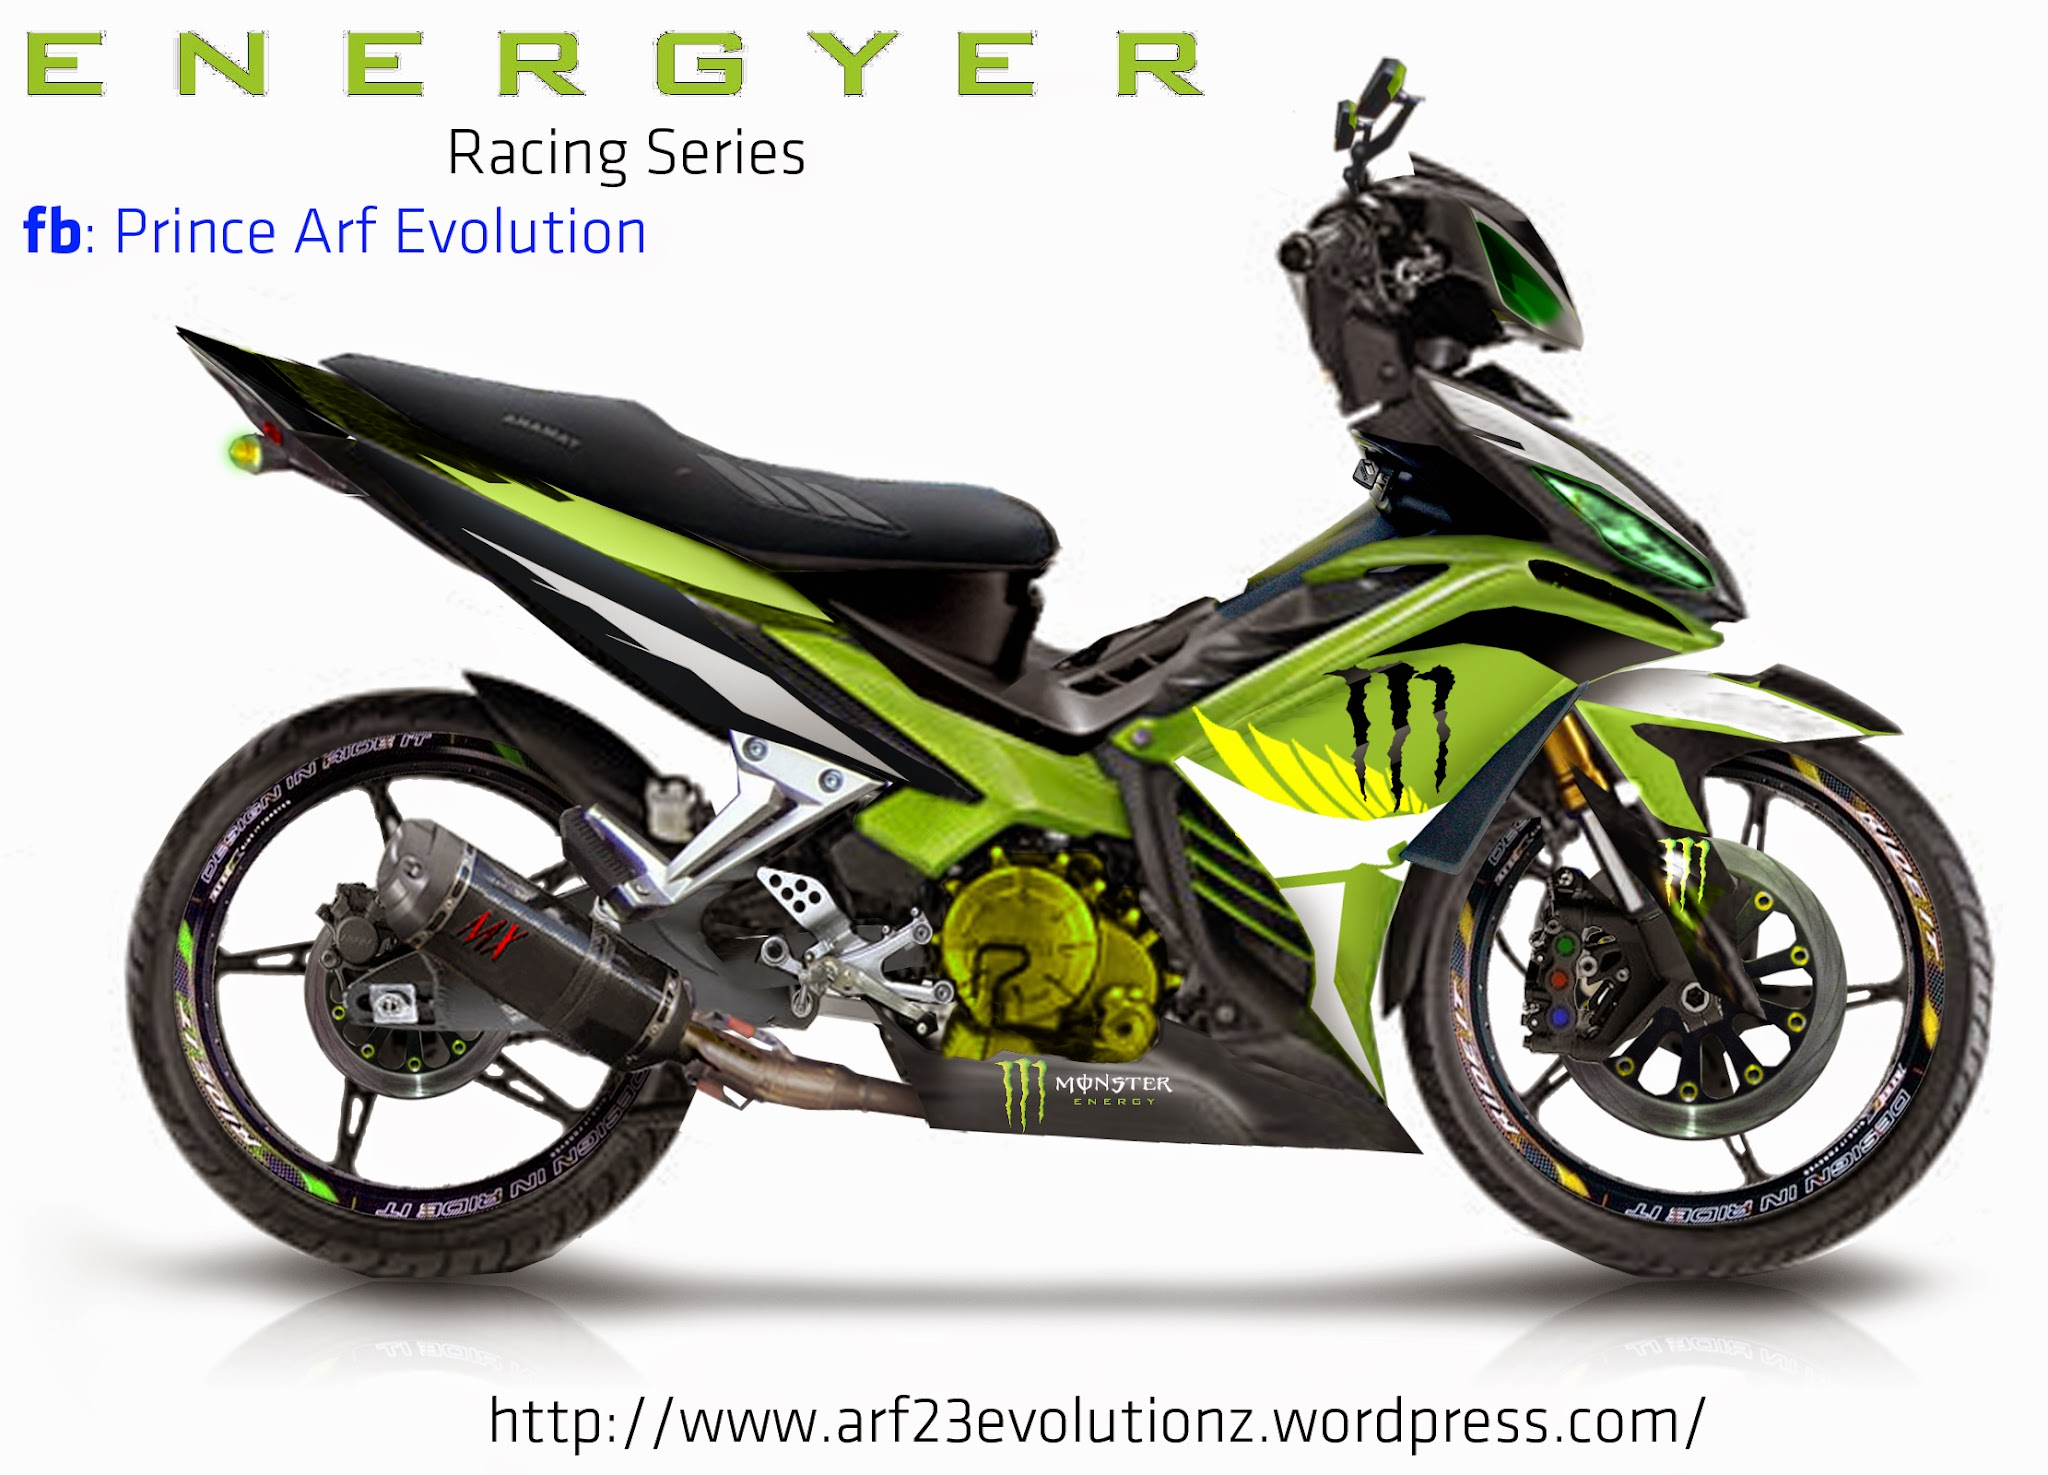 Kumpulan Modifikasi Motor Jupiter Mx Harian Terlengkap Dunia Motor